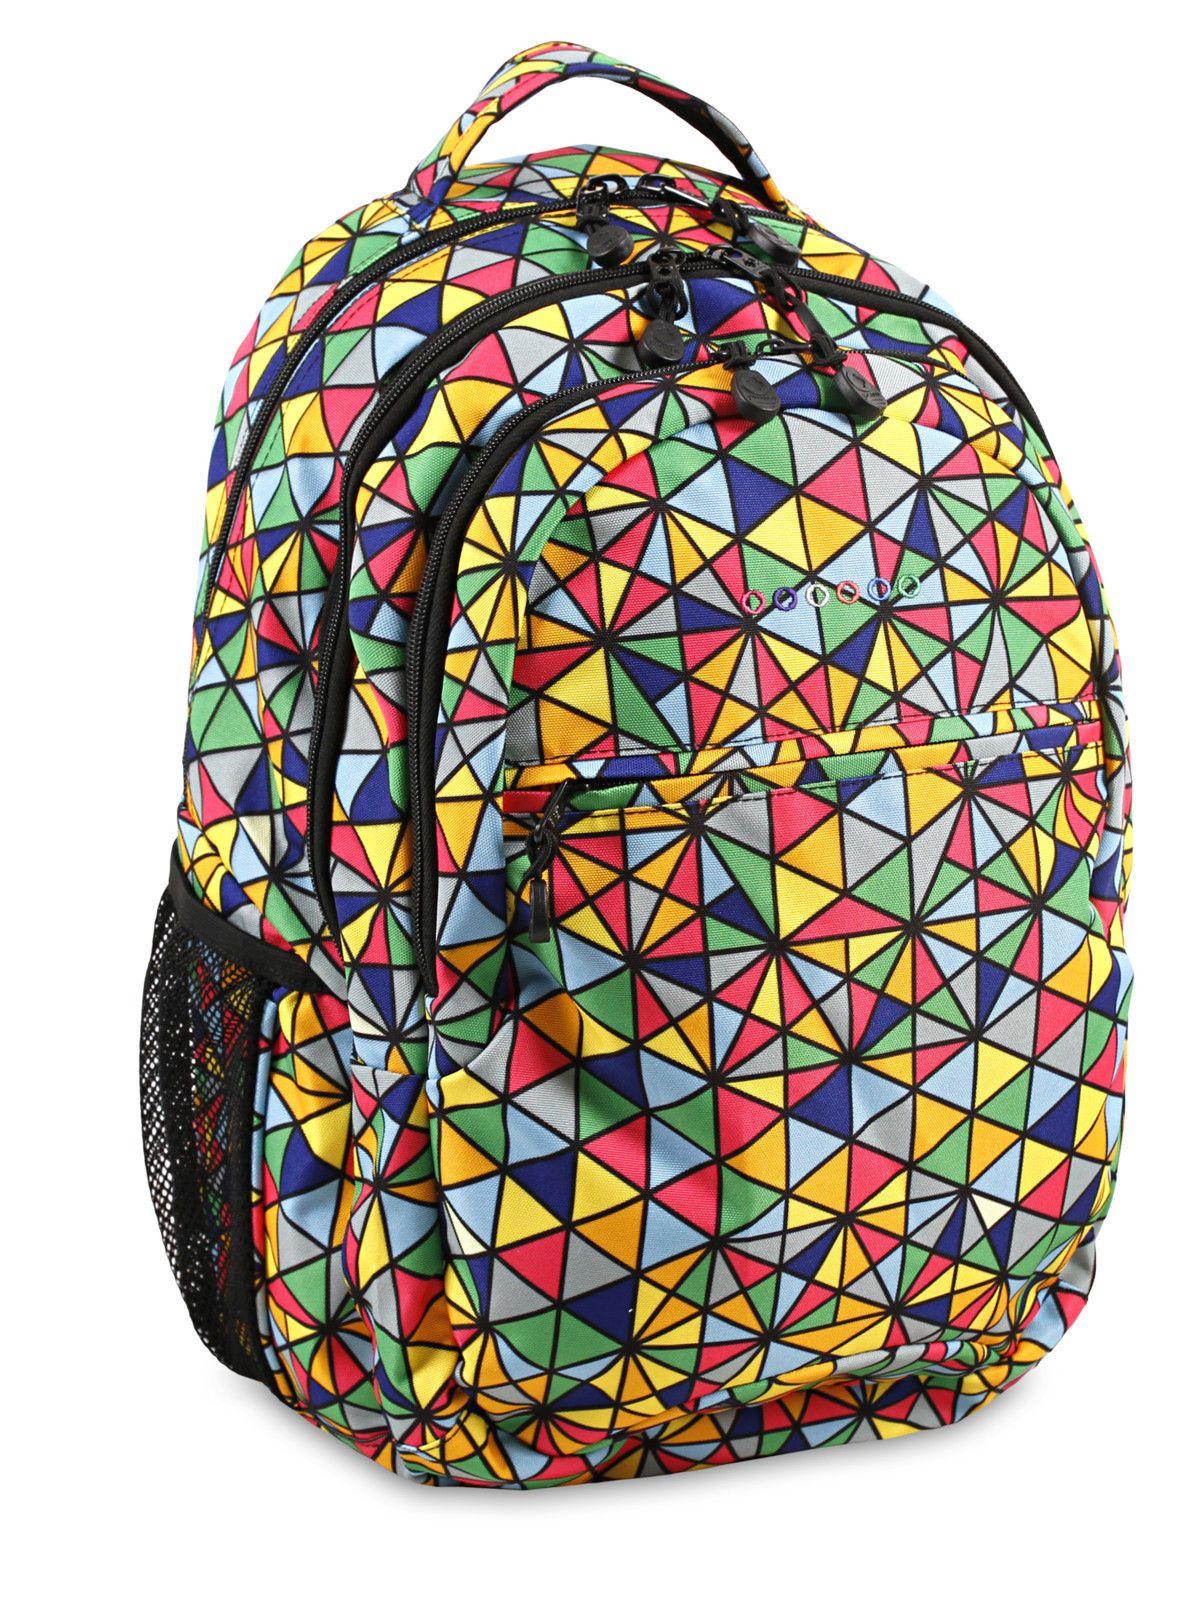 622745c9039 Fashion Colorful Backpack Children School Bags For Girls Printing Backpacks  | eBay